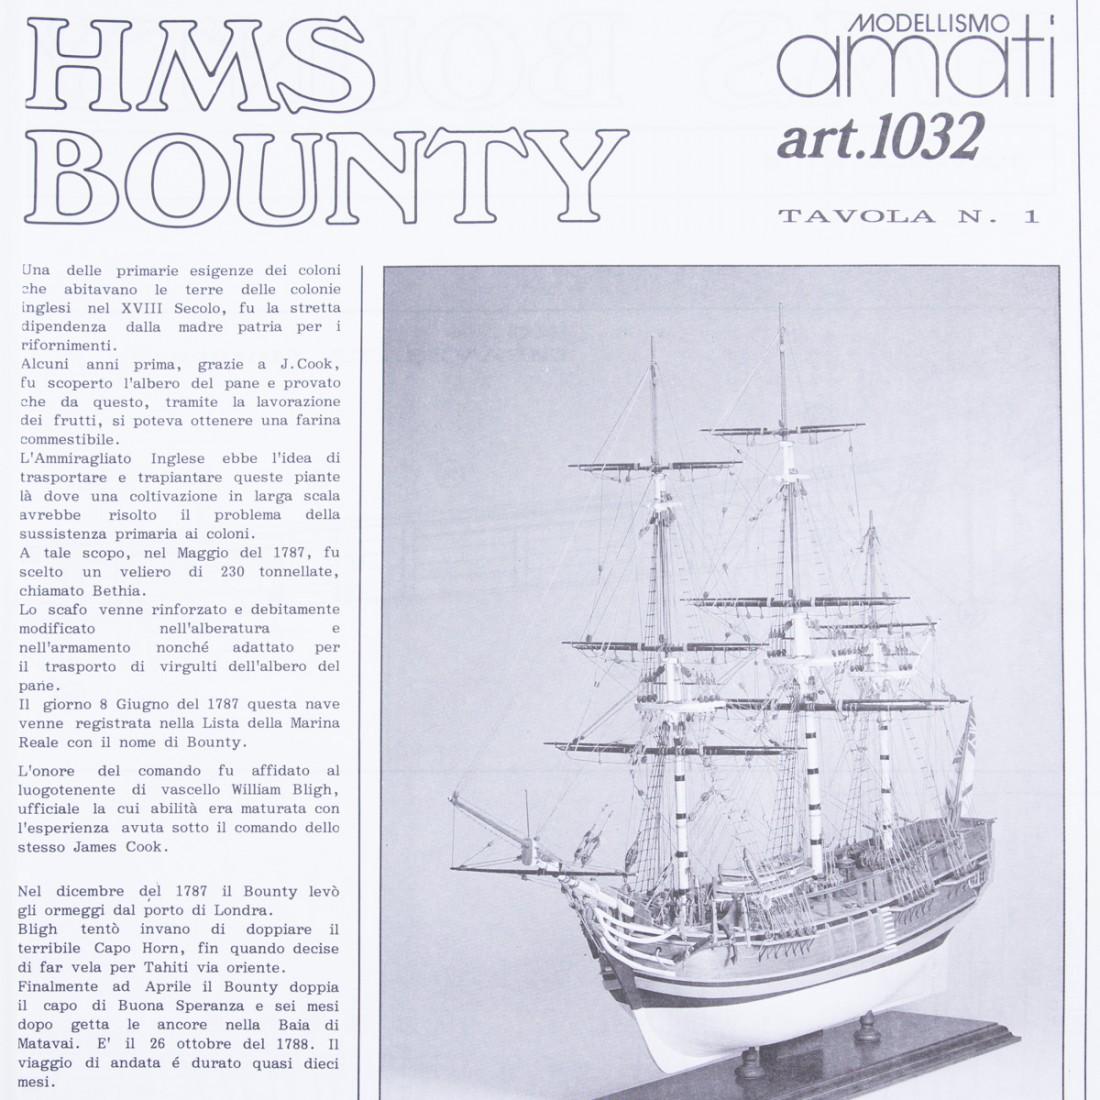 Plan de recompensas HMS